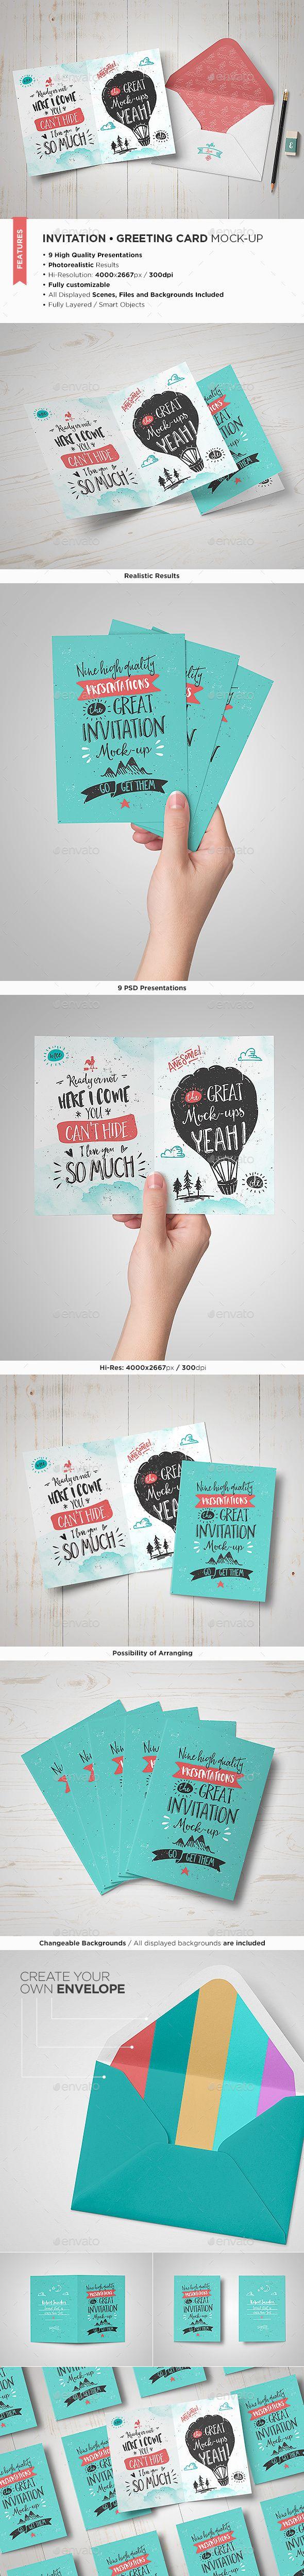 Invitation greeting card mock up mockup cards and invitation invitation greeting card mock up stopboris Choice Image